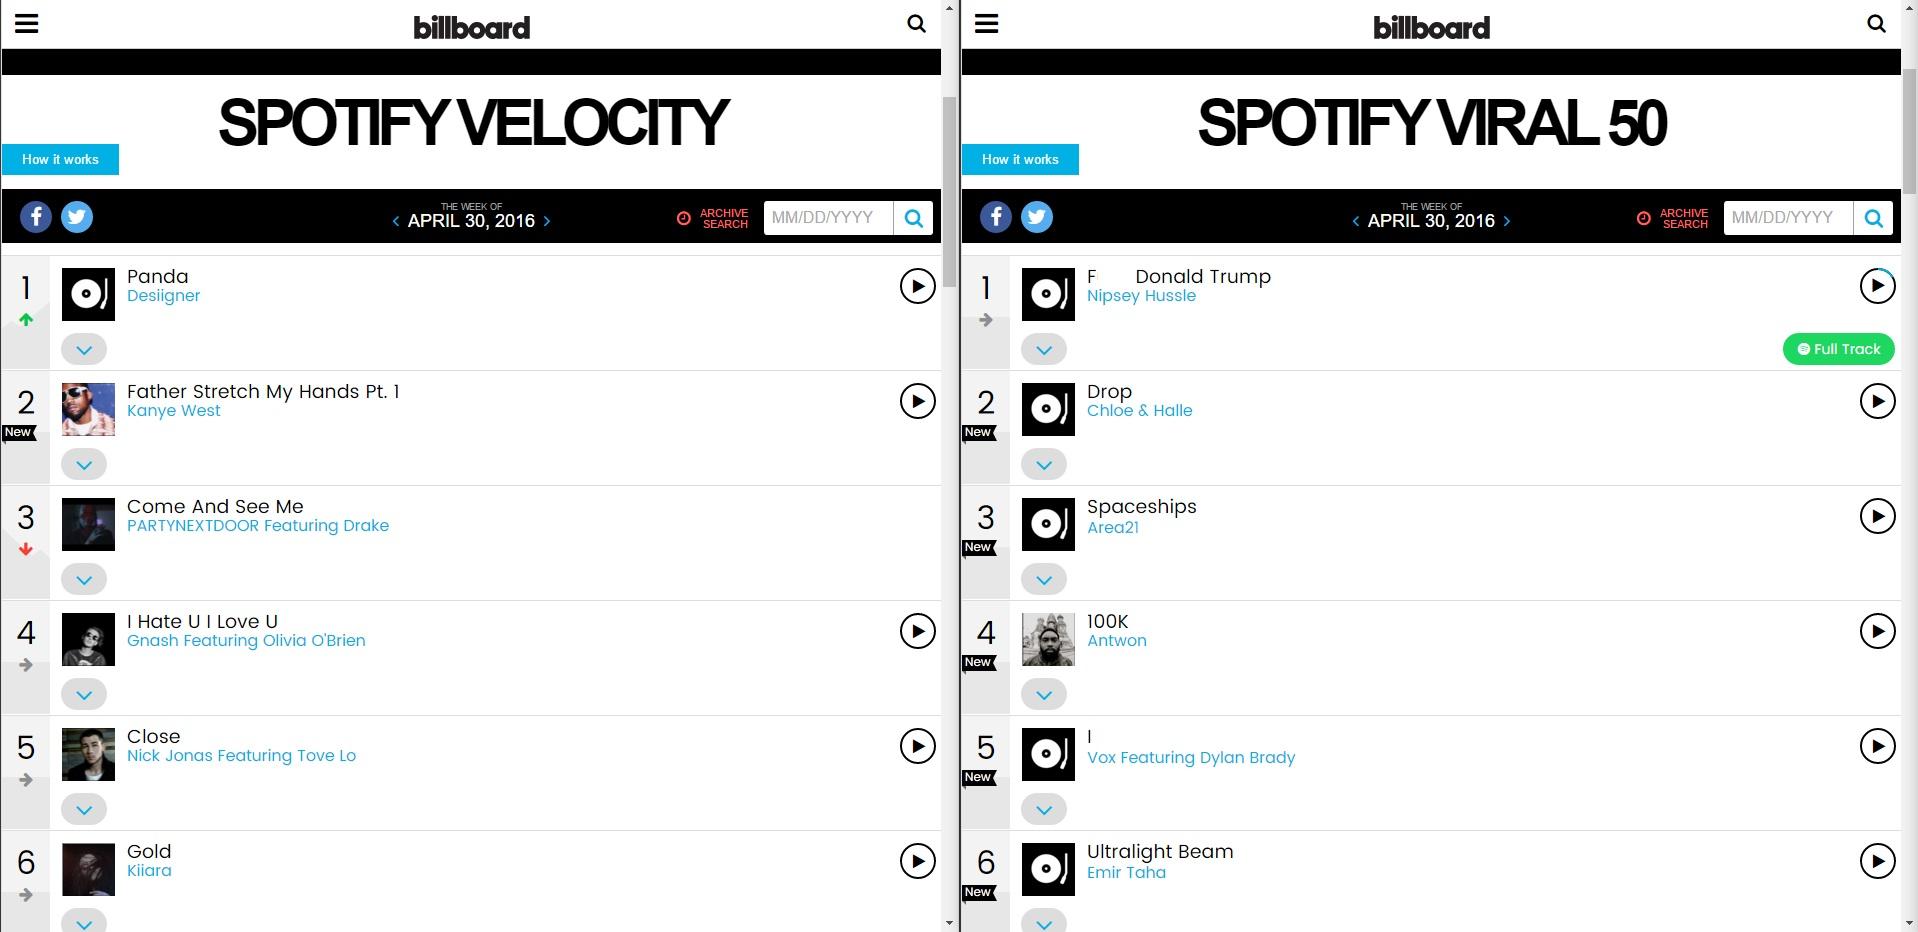 Billboard Partner Charts Playlist